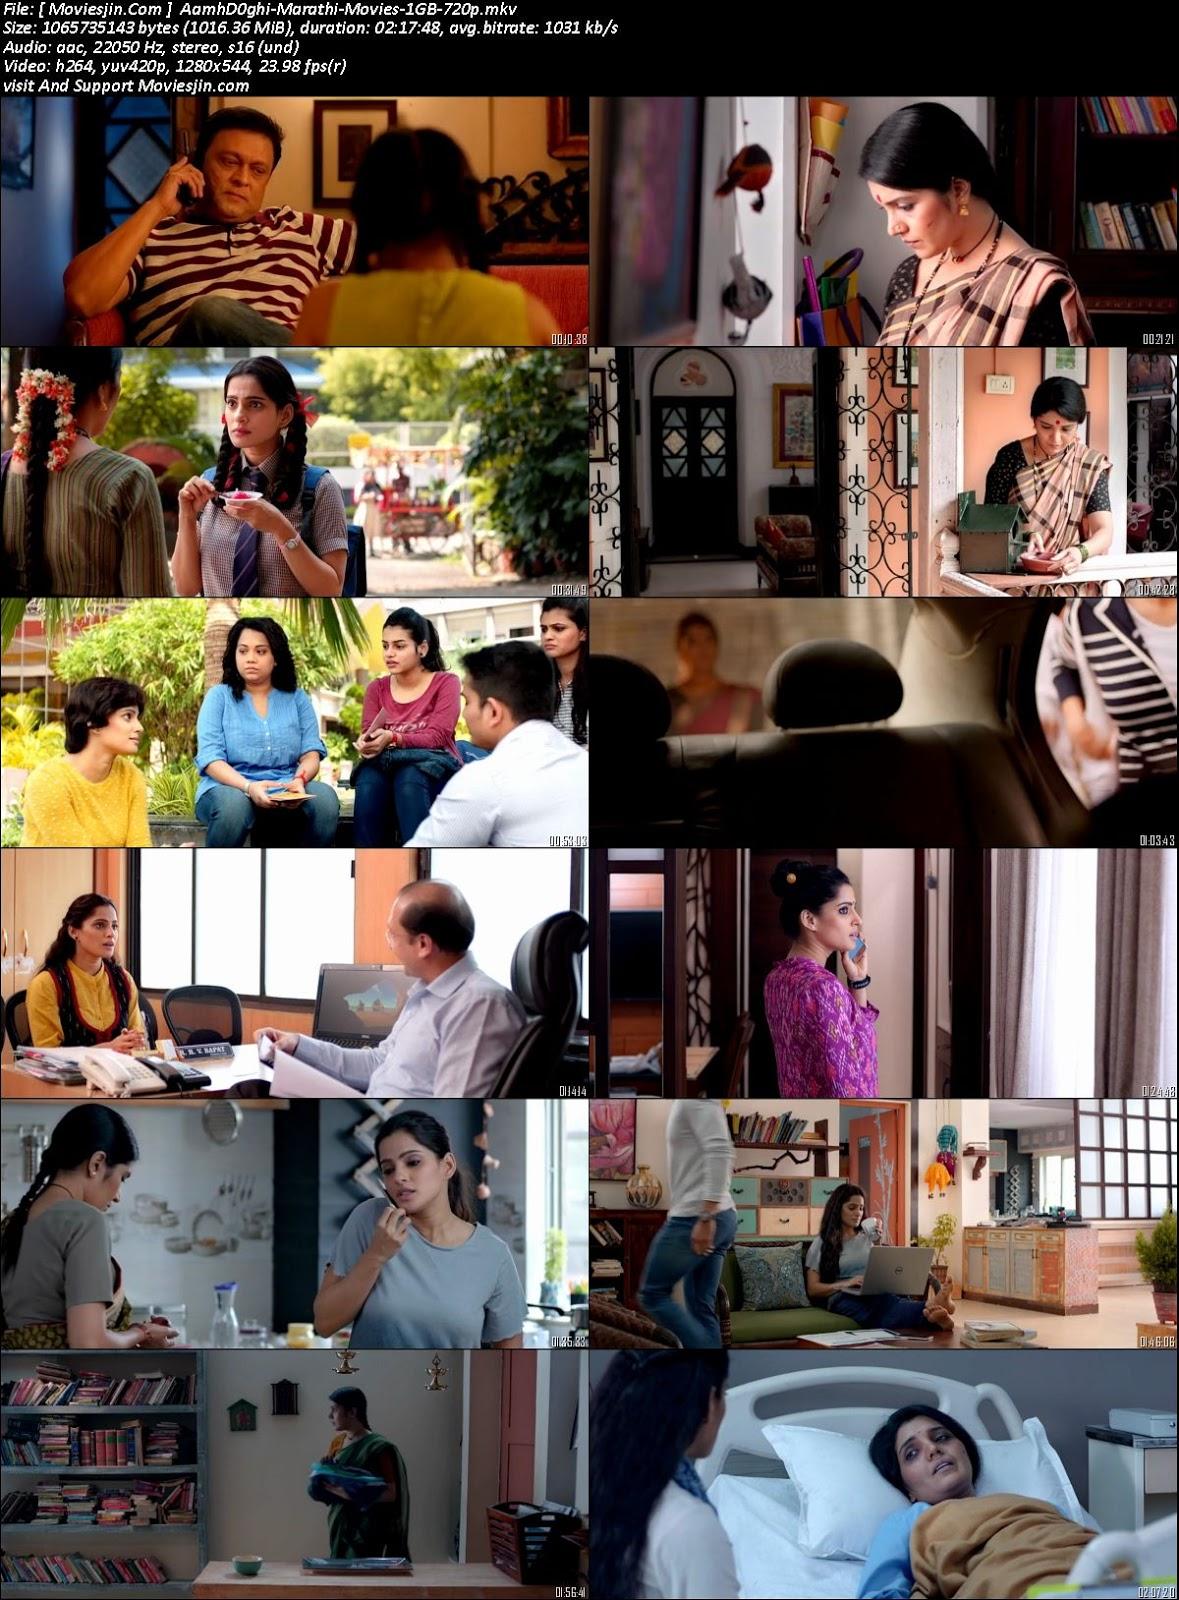 Watch Online Aamhi Doghi 2018 WEBRip 1Gb Marathi Movie 720p Full Movie Download Khatrimaza, free download 9xmovies,